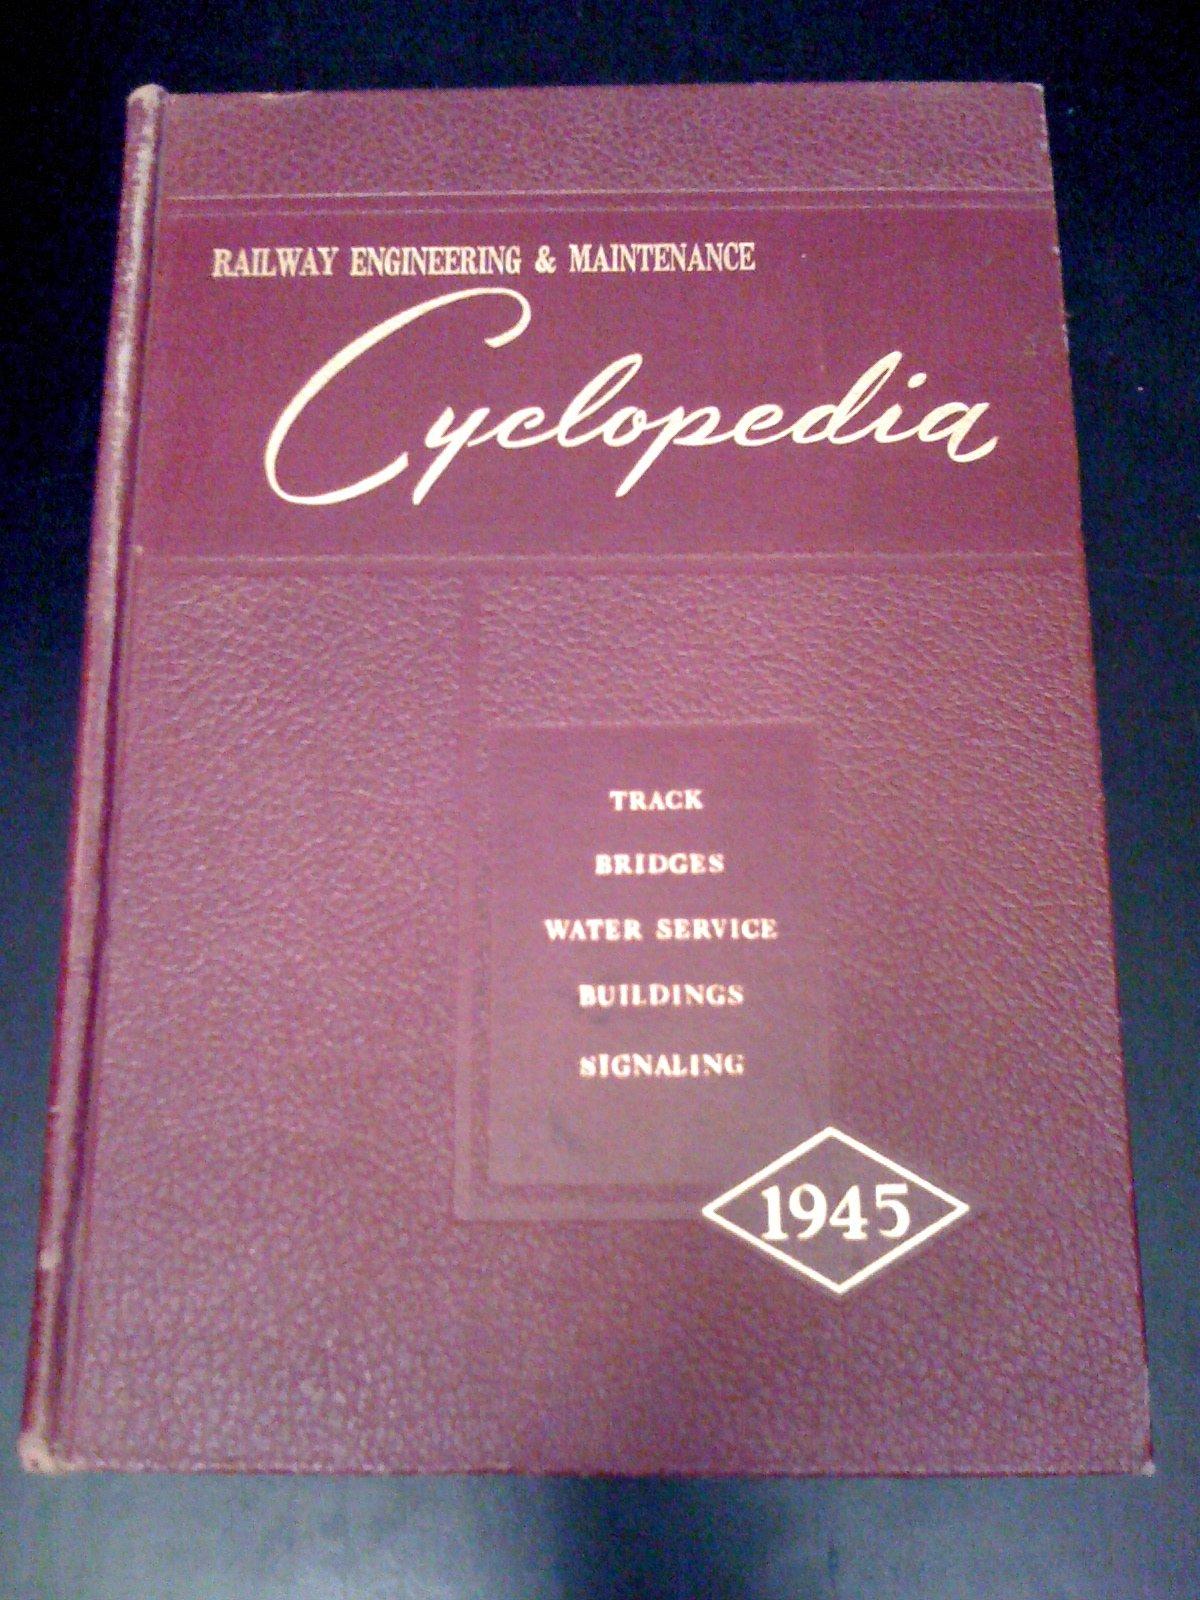 Railway Engineering & Maintenance Cyclopedia